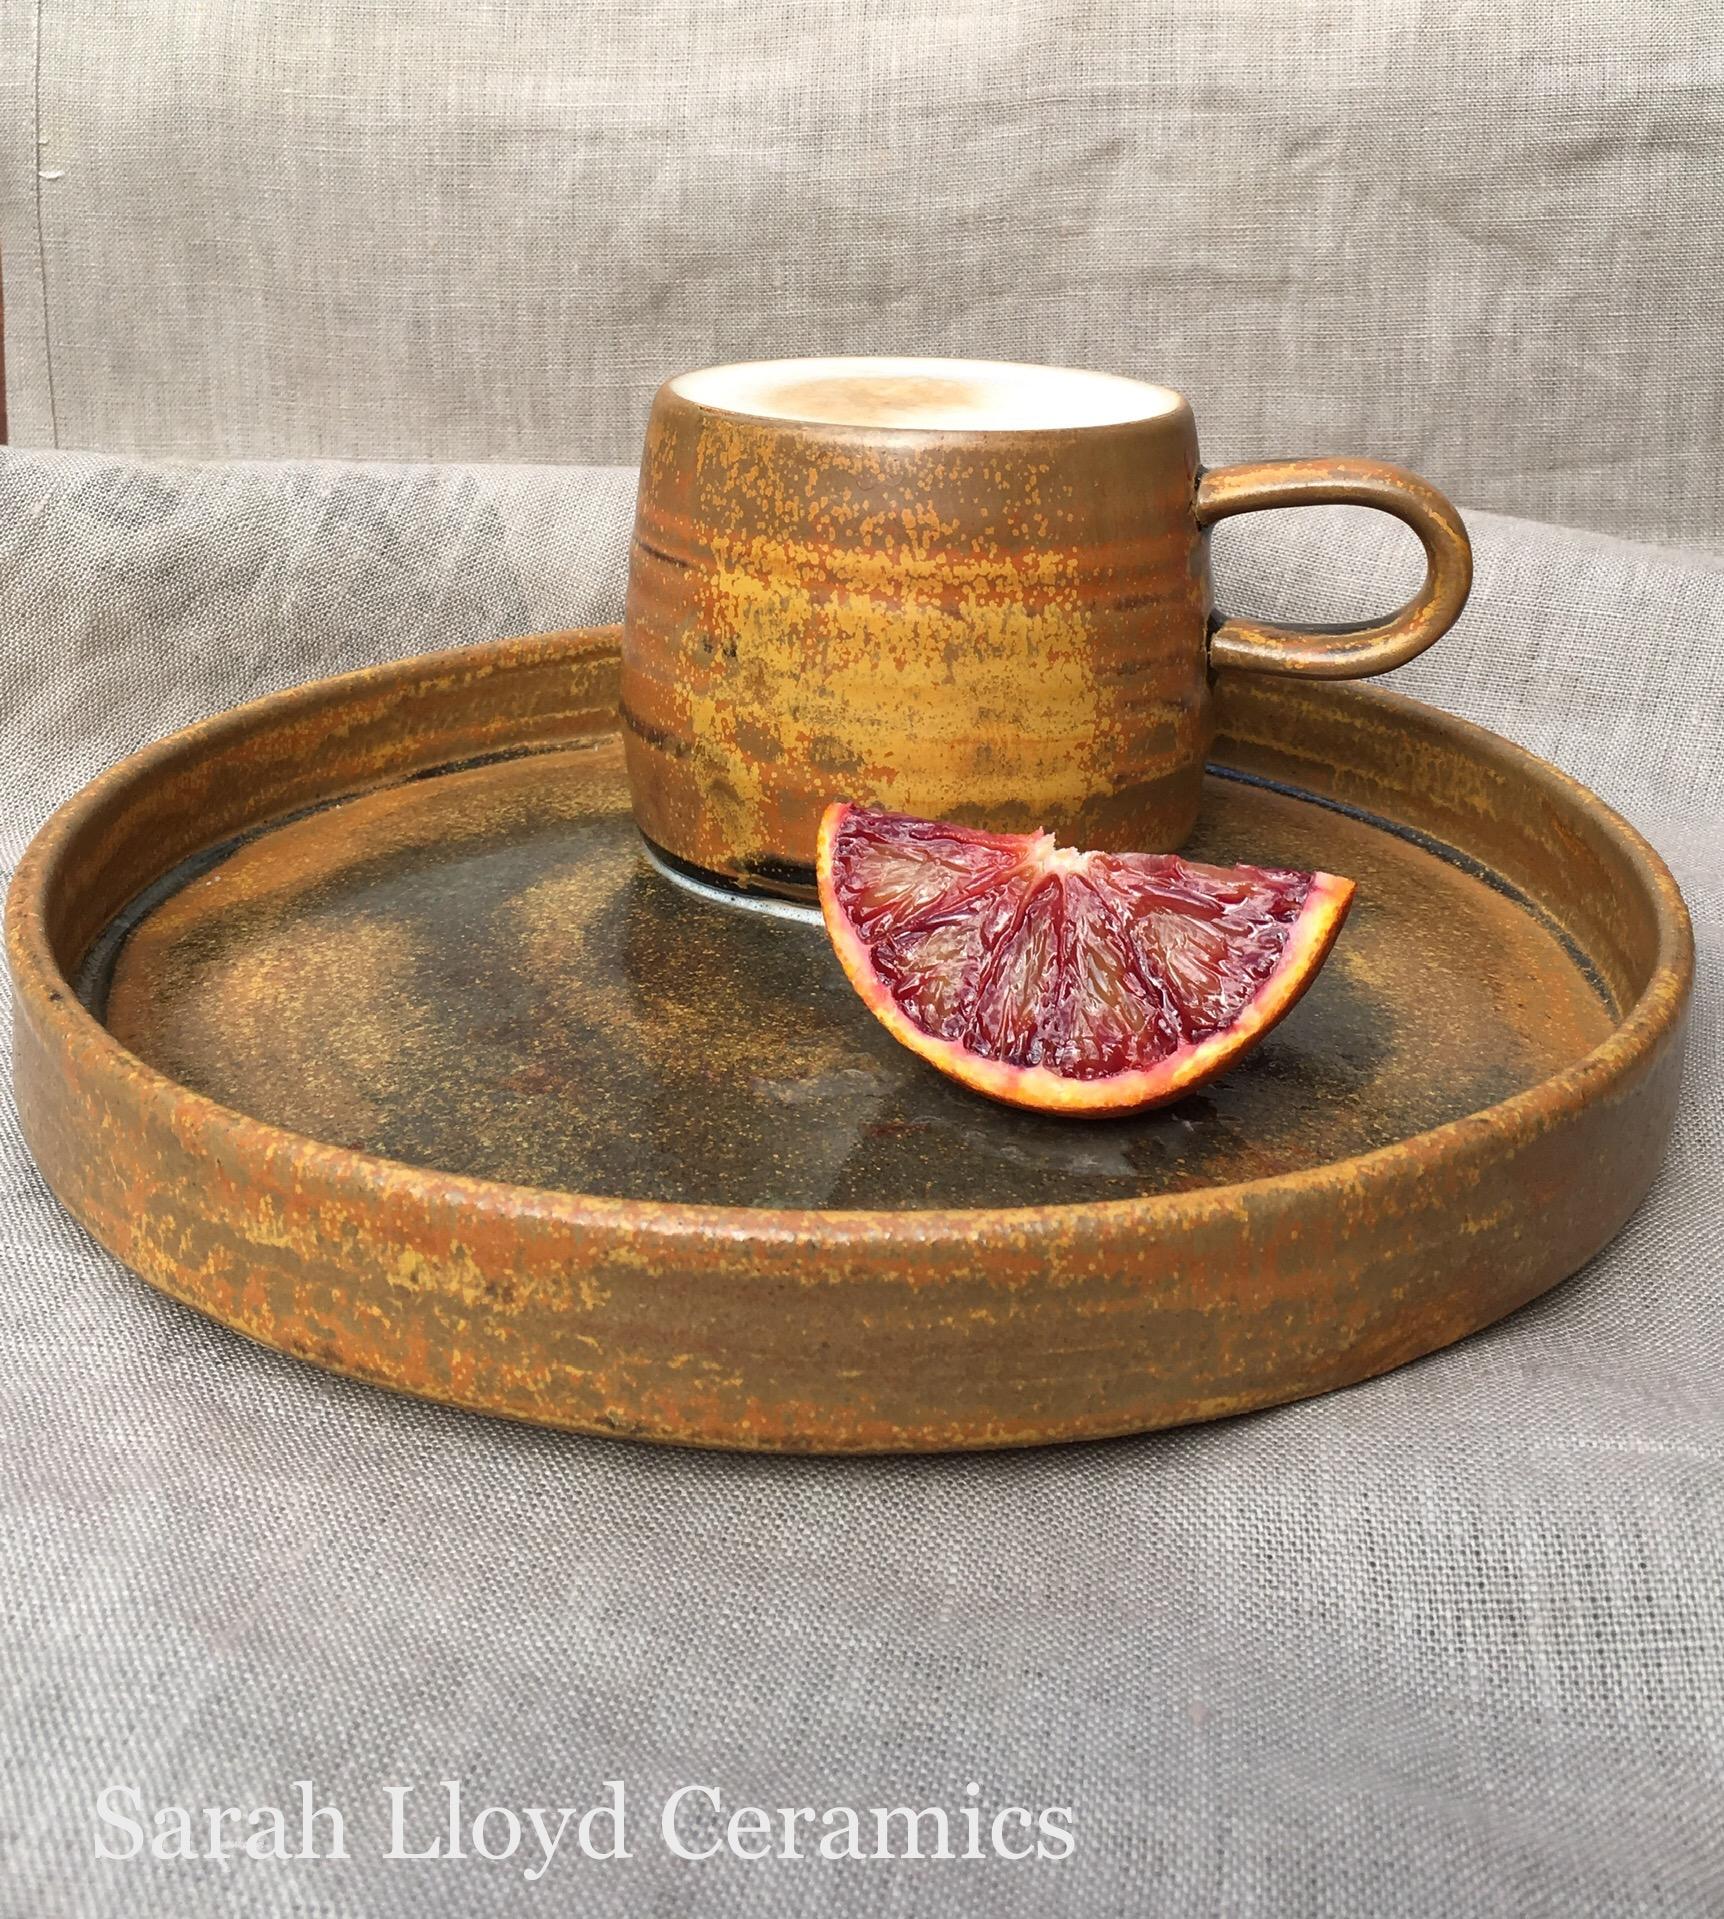 Sarah Lloyd Ceramics